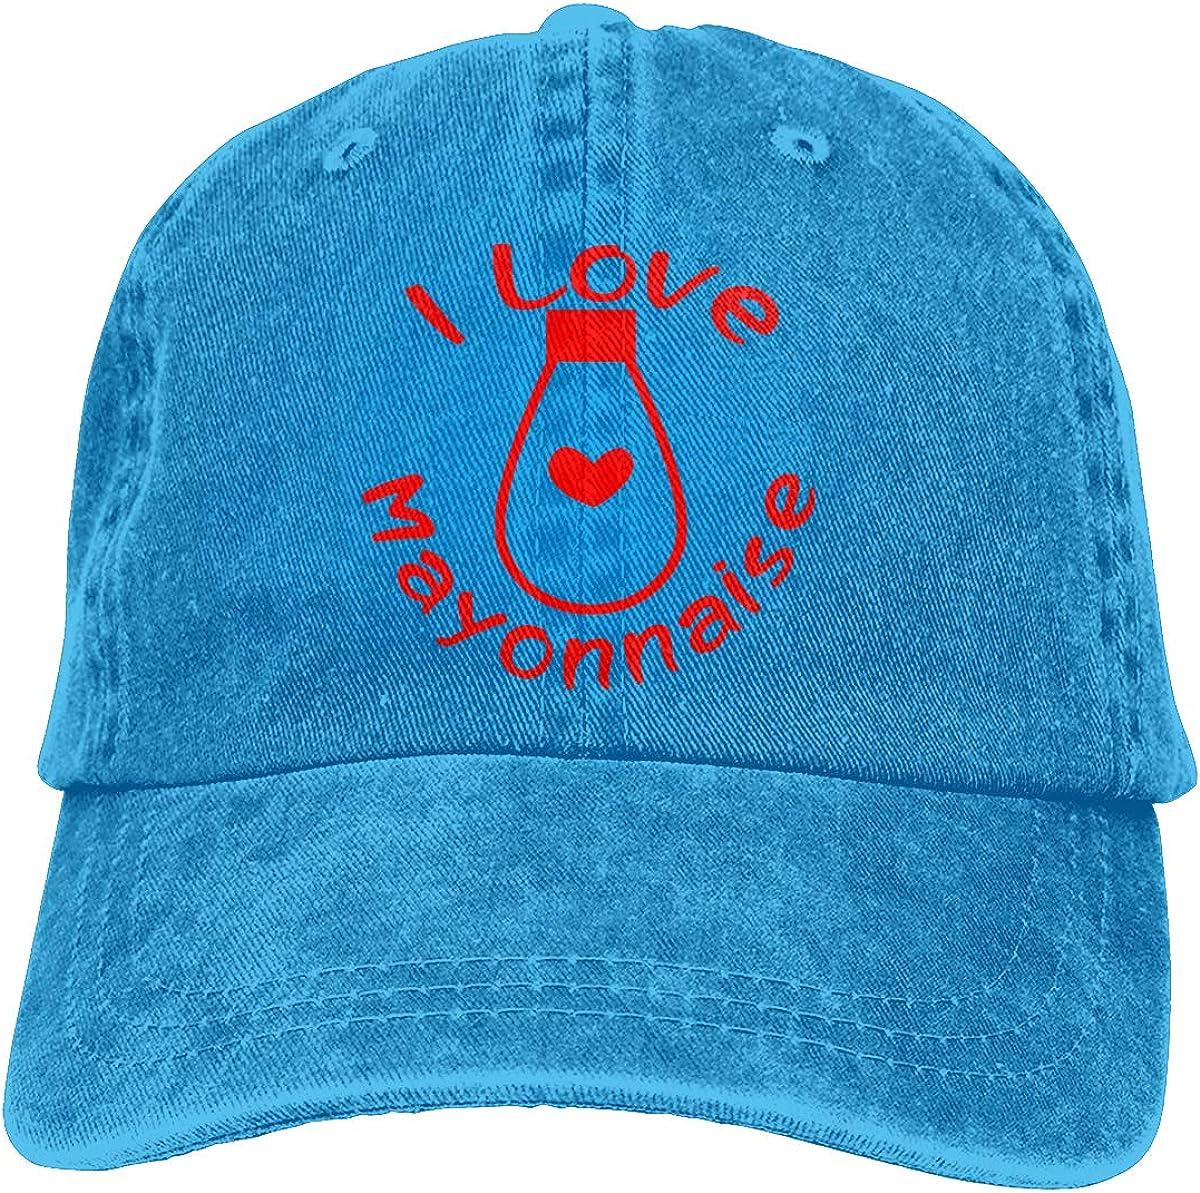 I Love Mayonnaise Unisex Trendy Denim Casquette Adjustable Baseball Cap